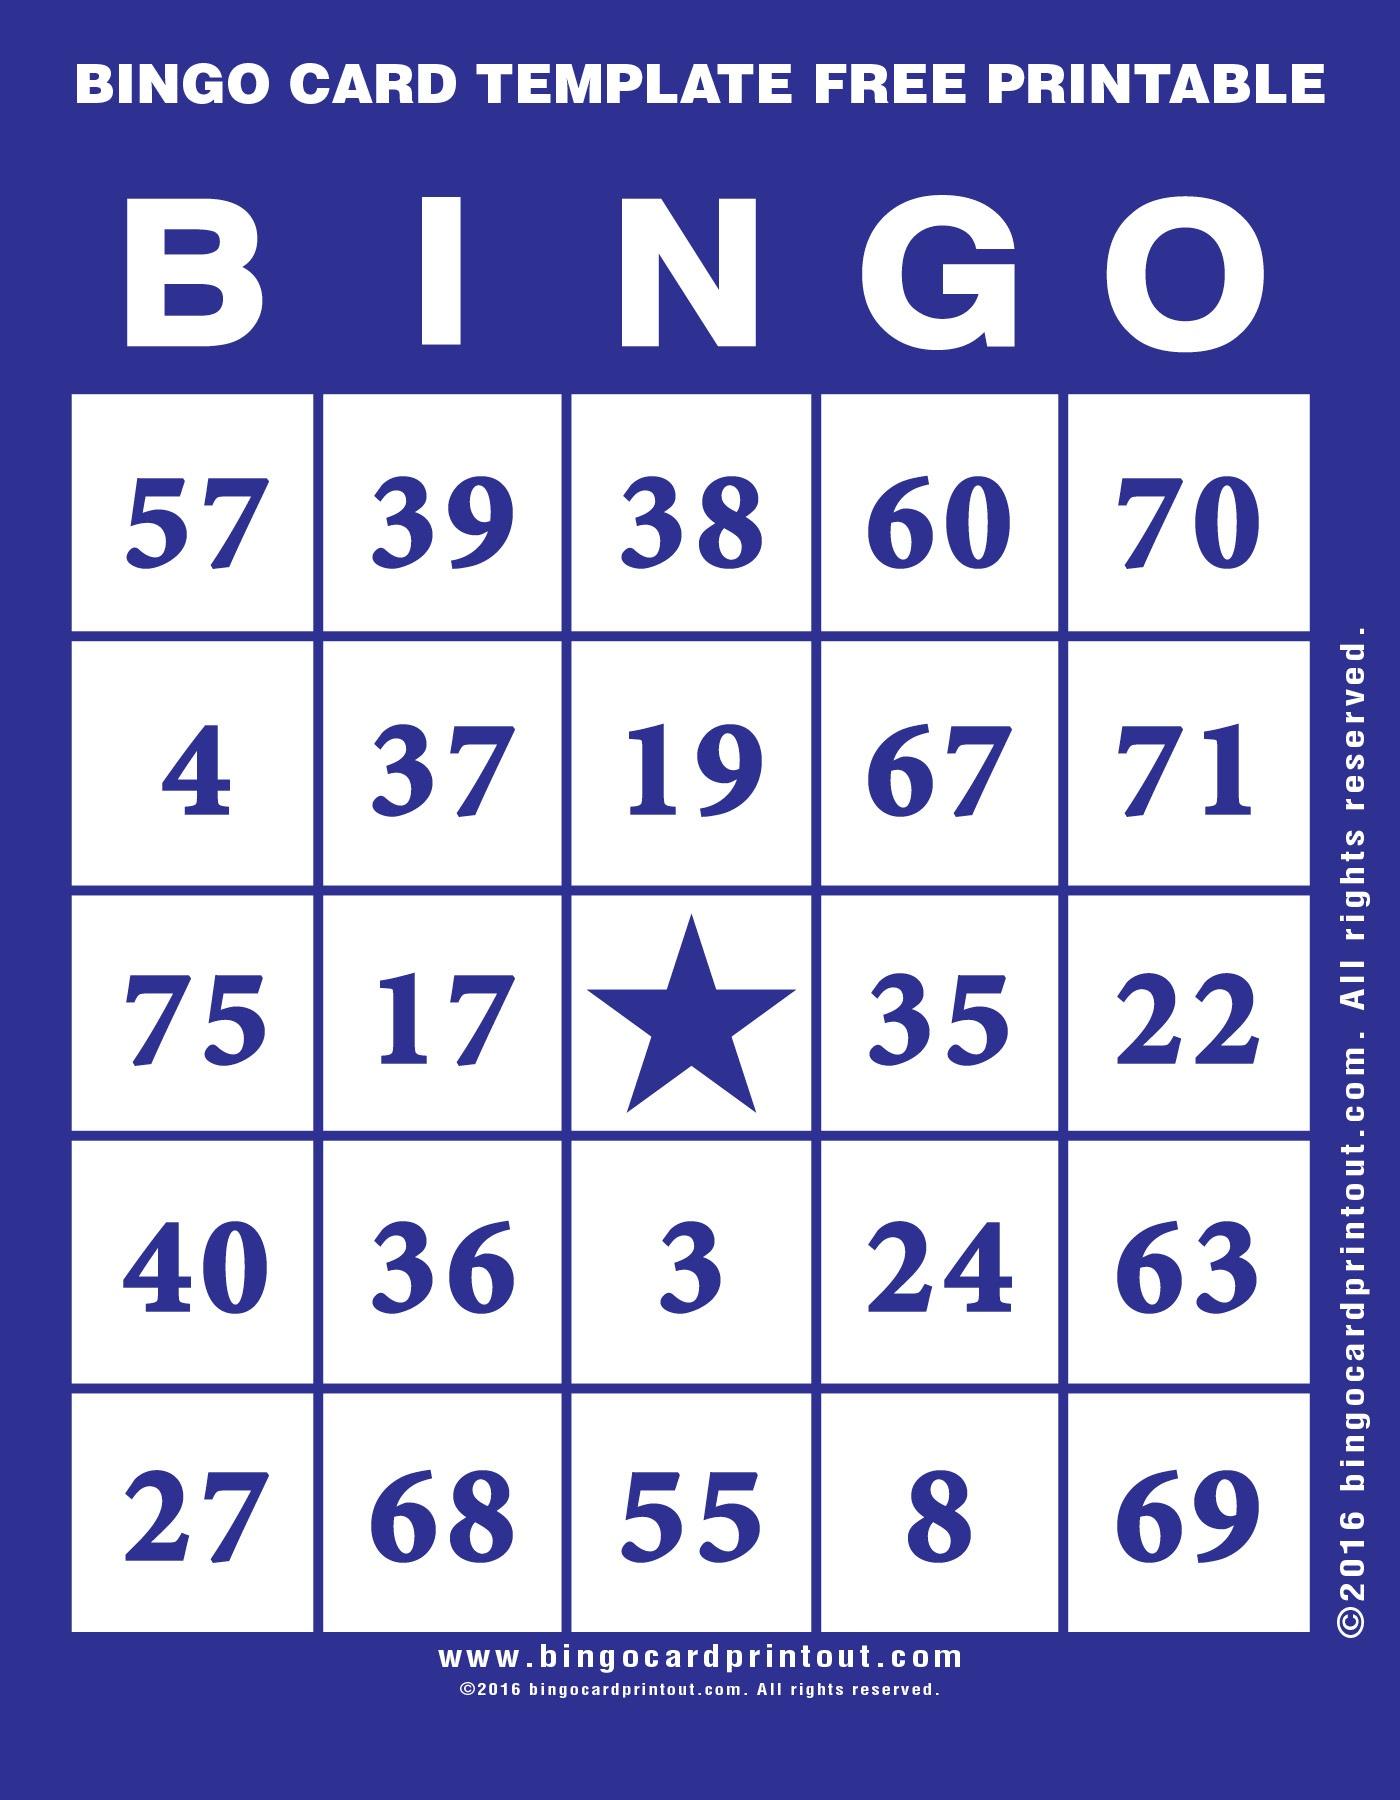 Bingo Card Template Free Printable - Bingocardprintout - Free Printable Bingo Cards 1 75